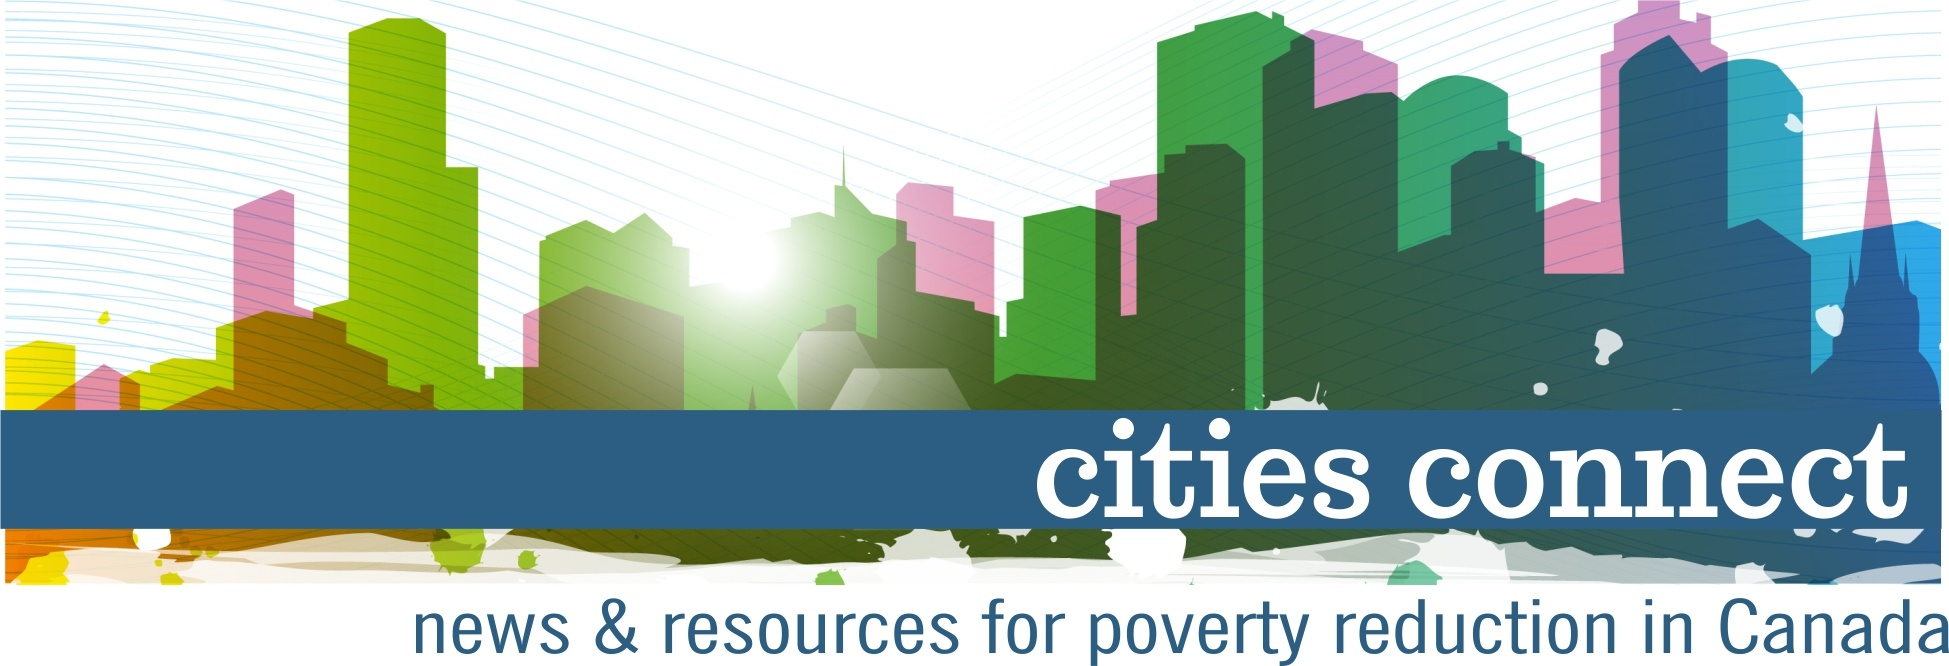 citiesconnectlarge